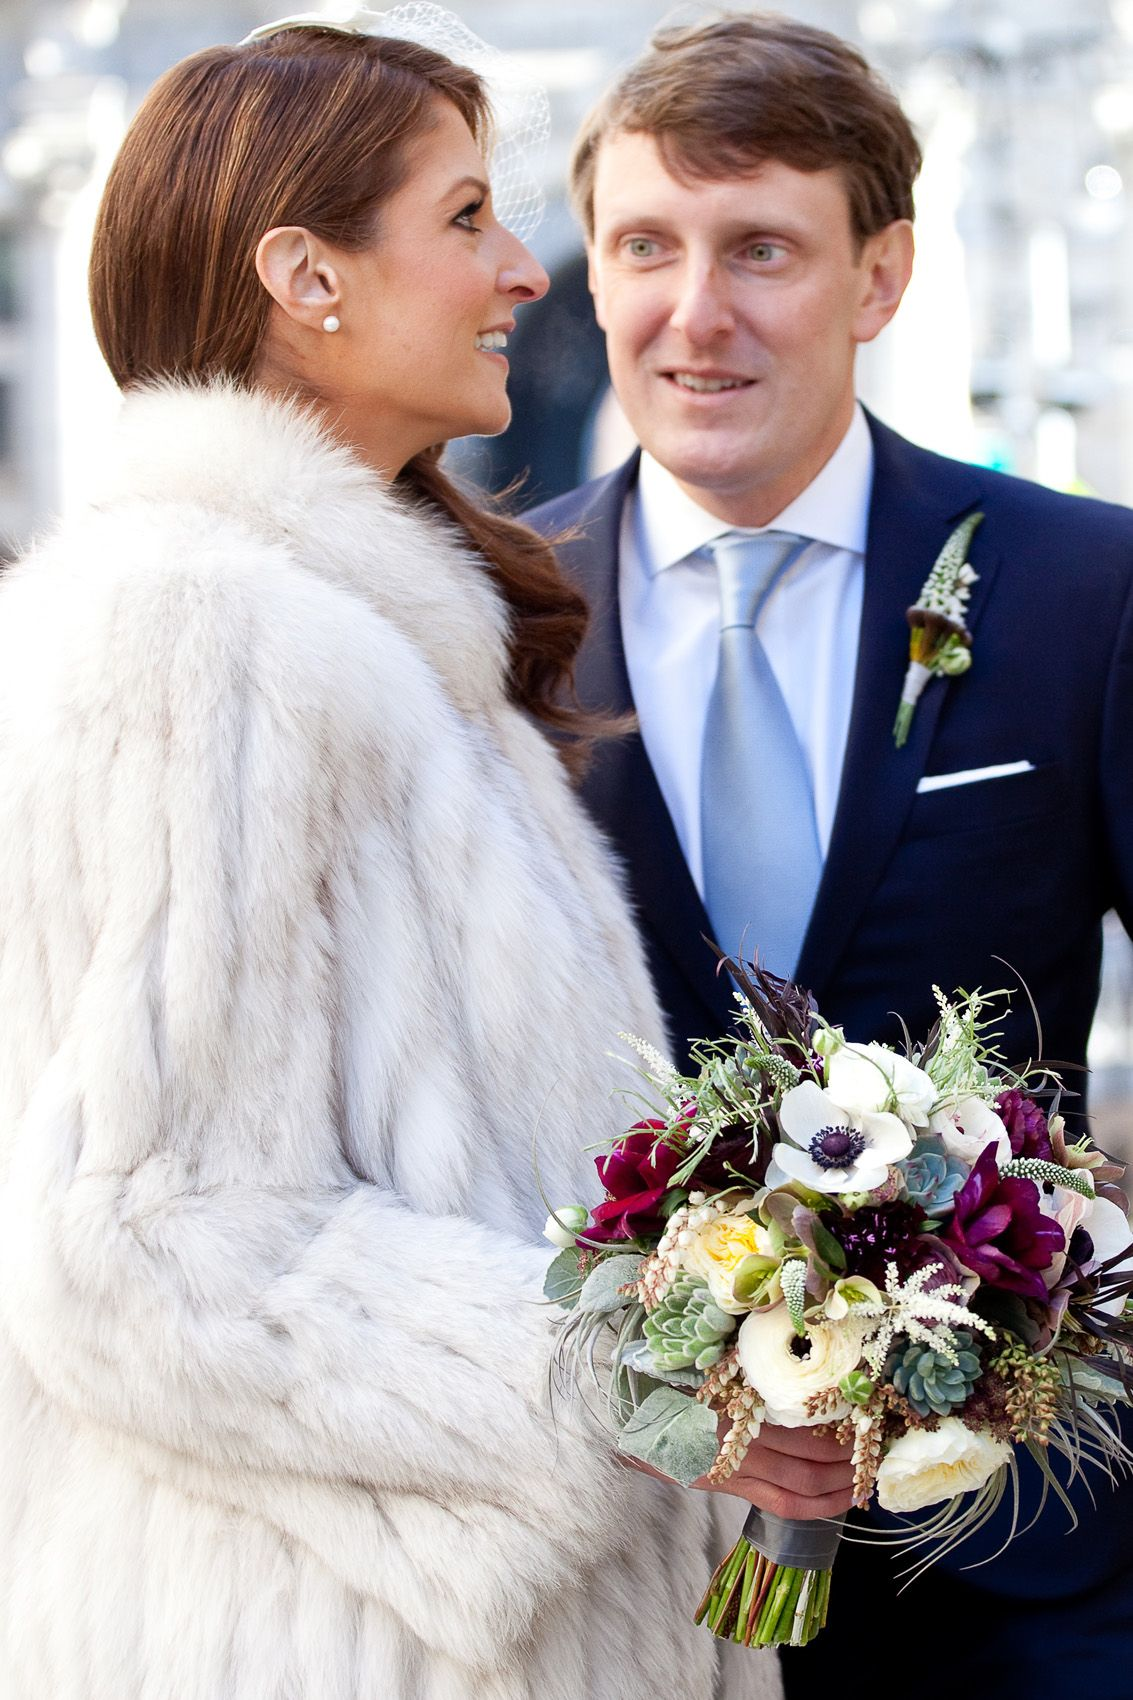 ChristopherWhite_Jordan_wedding_1.jpg